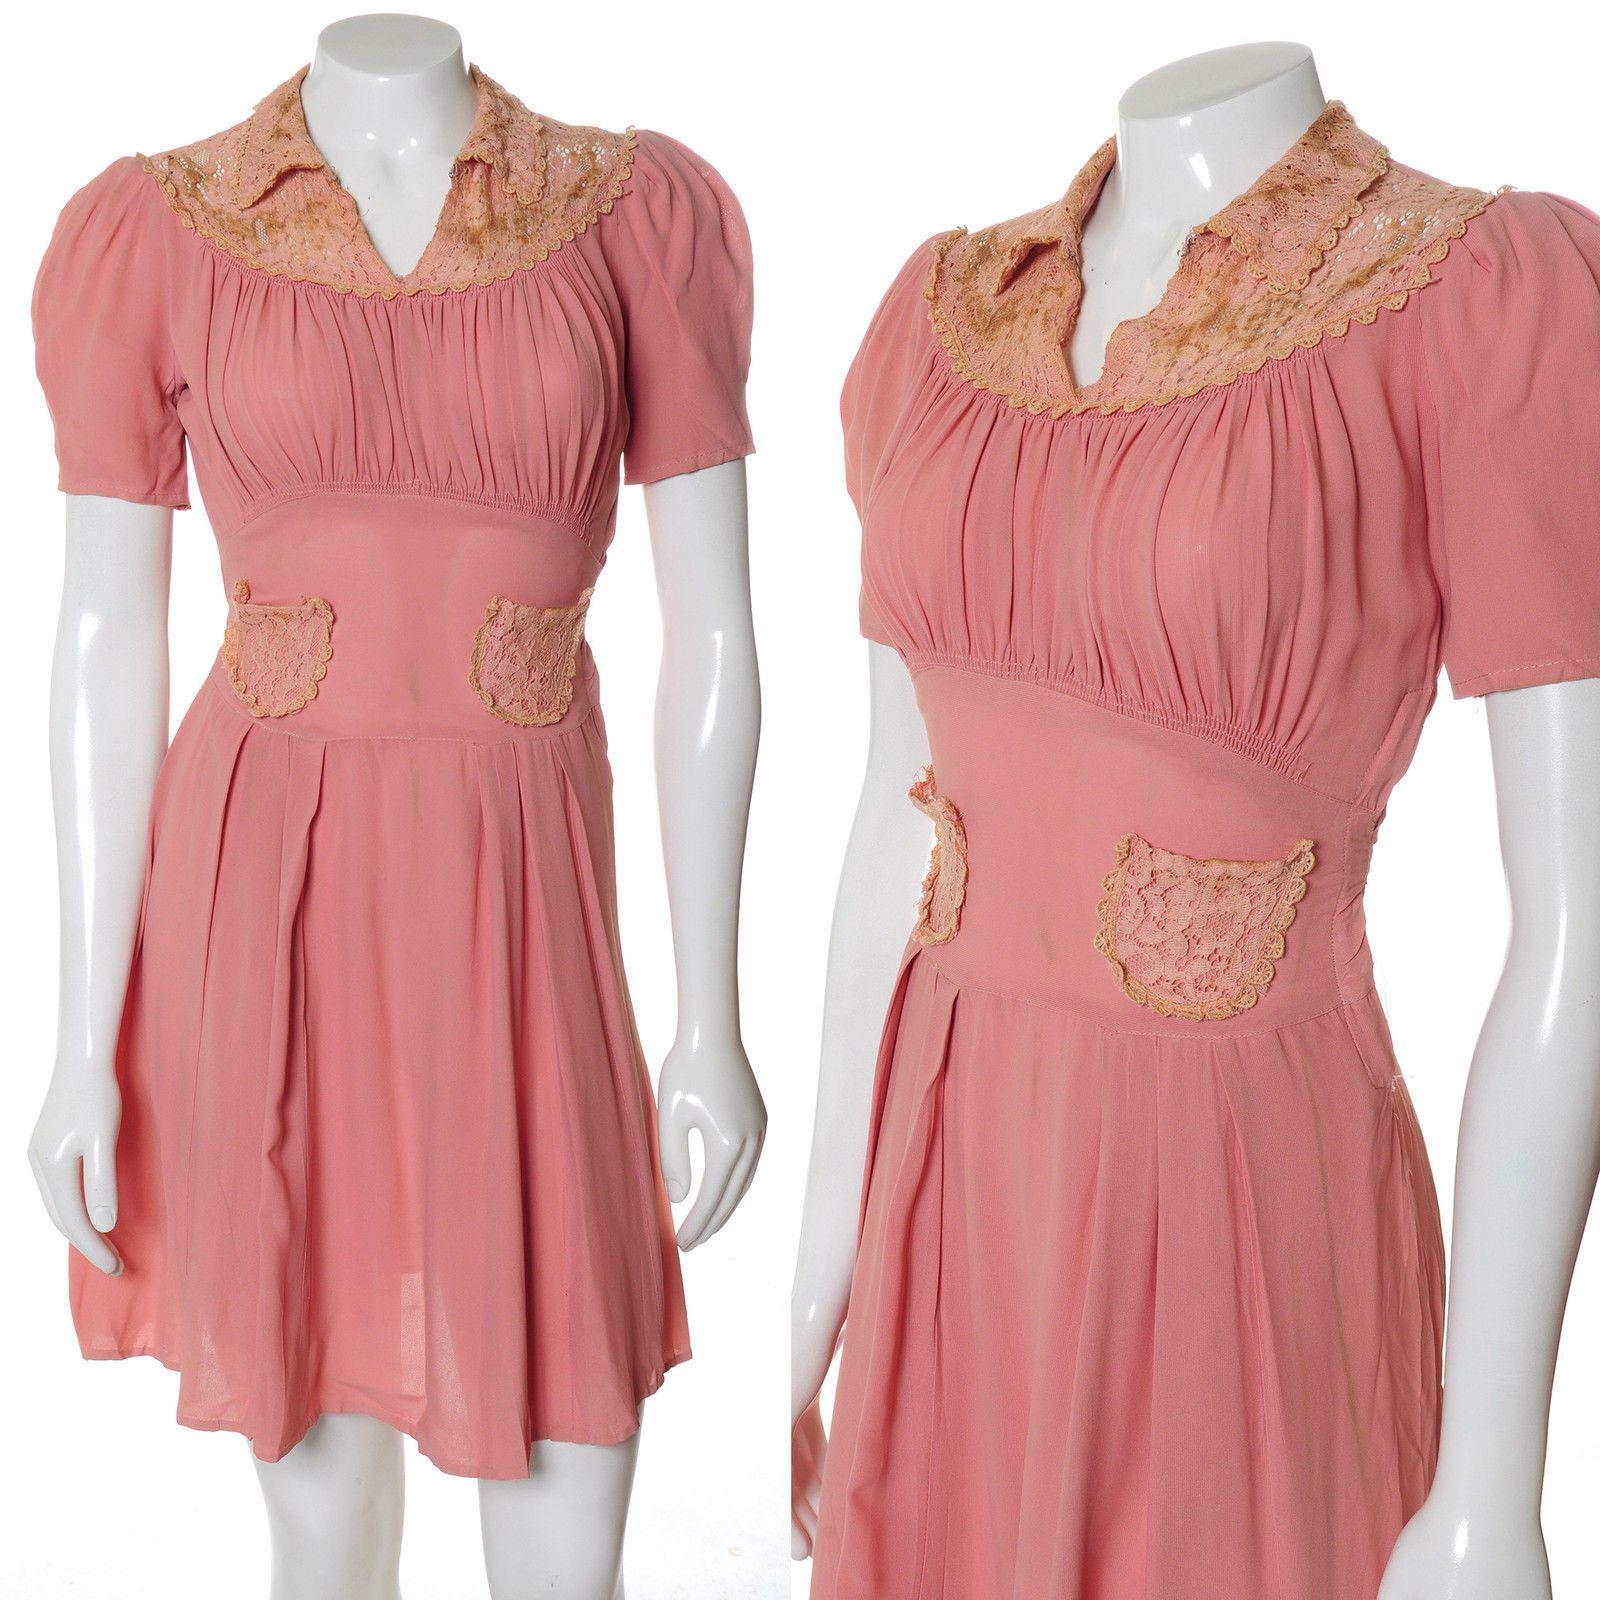 Imperfect crepe pink lace vintge s s babydoll mini swing dress